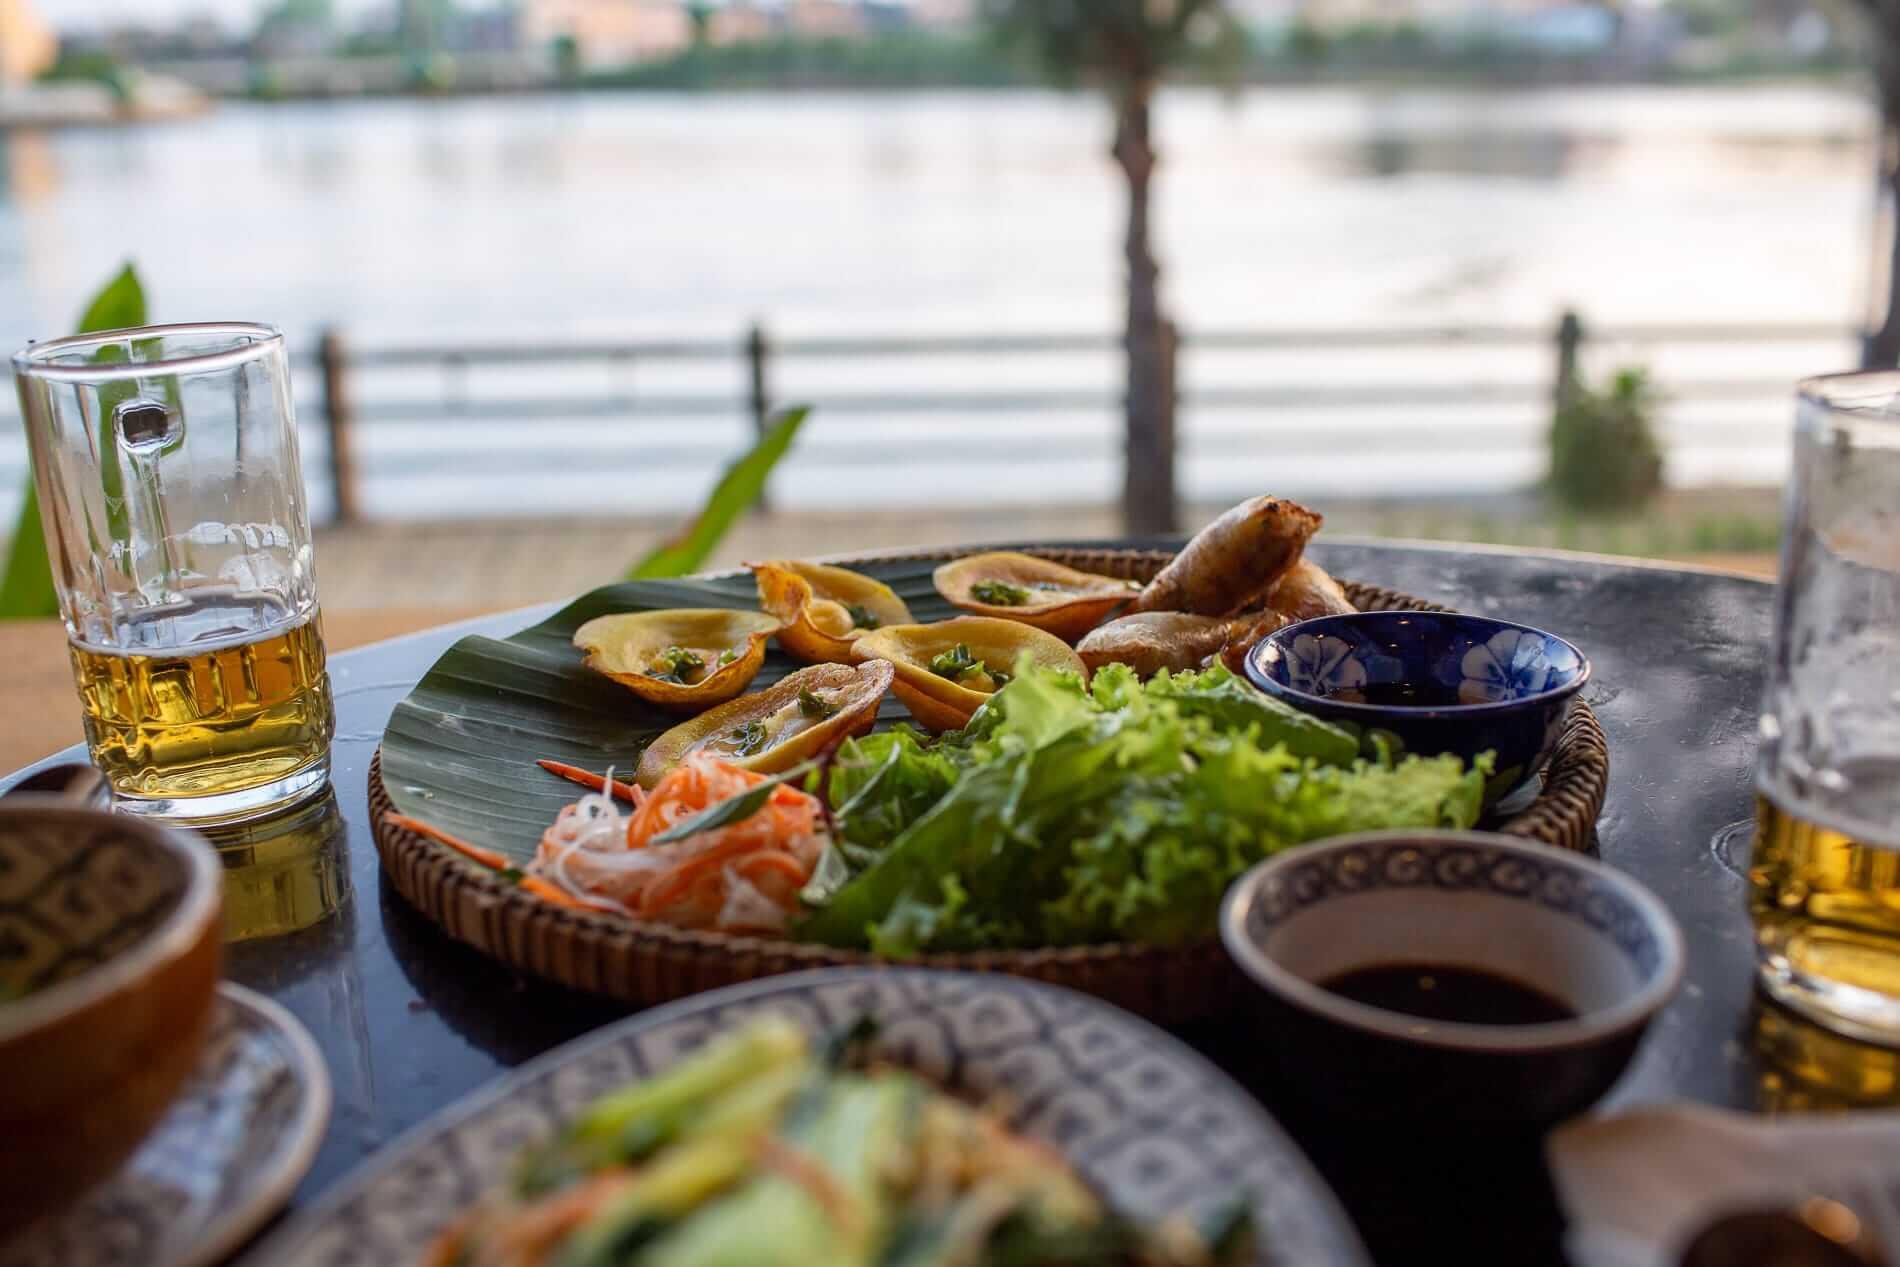 Authentic Vietnamese dishes at Hoa Hien Restaurant's riverside